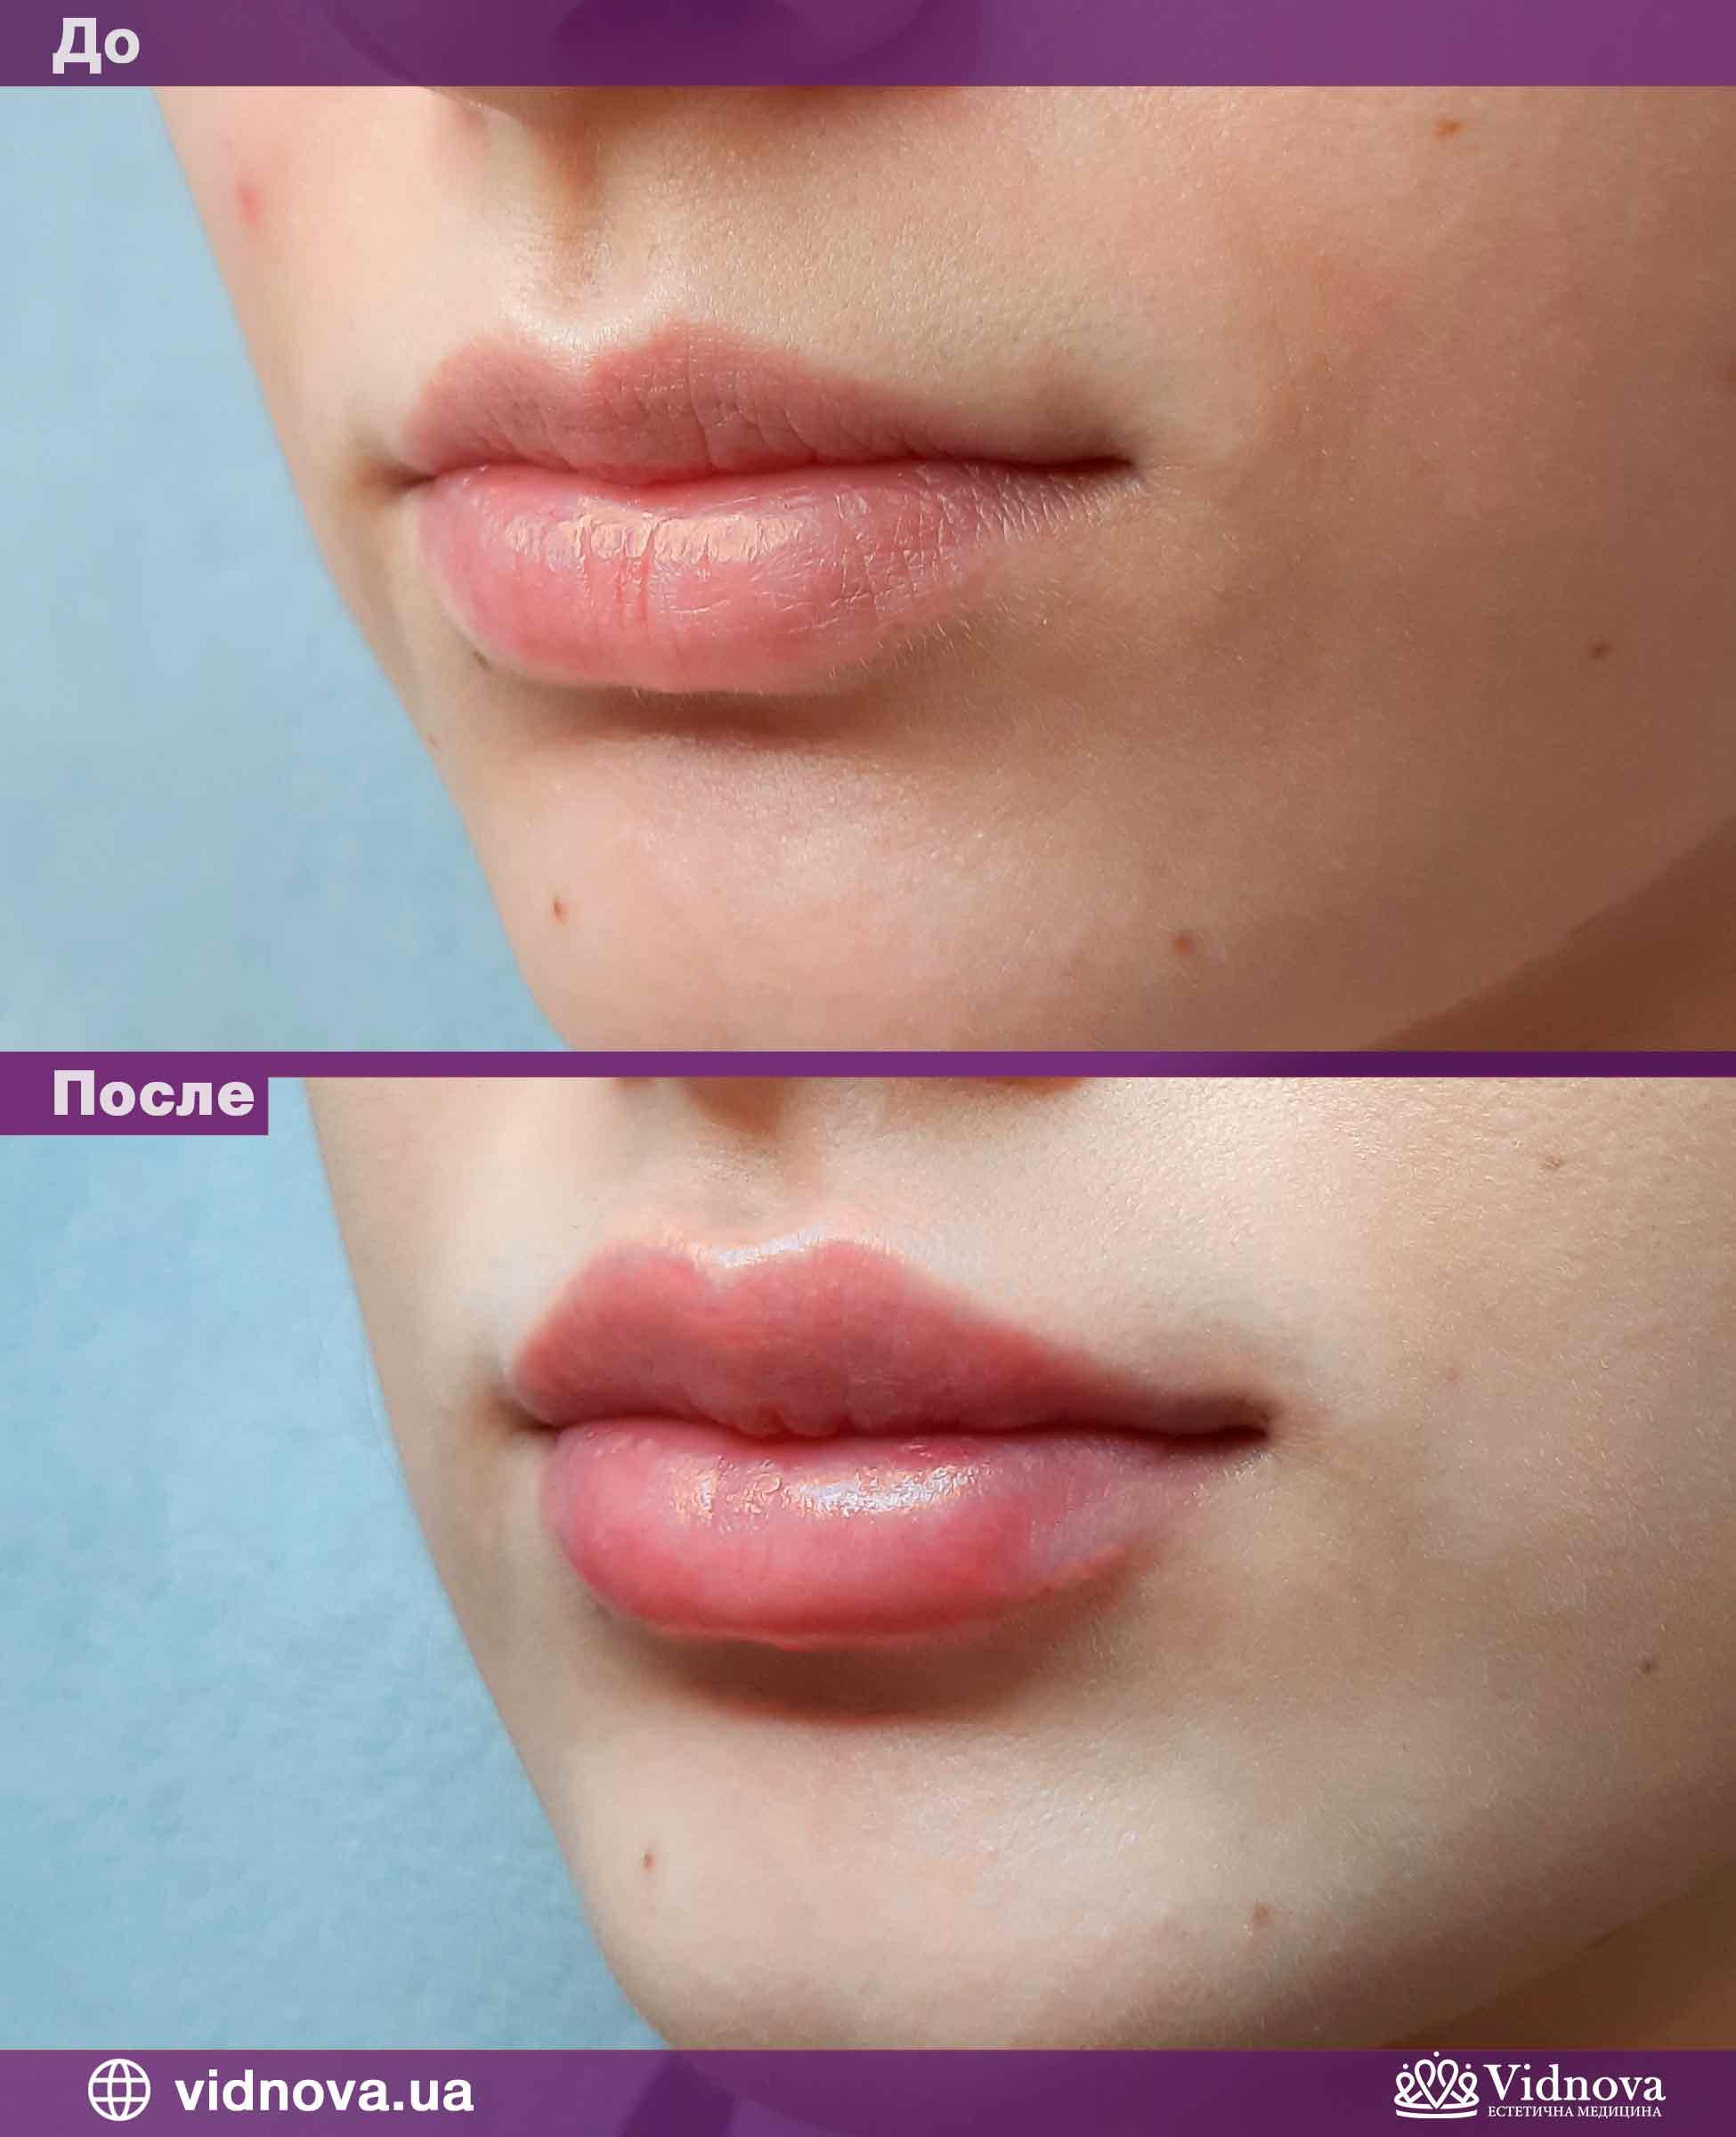 Увеличение губ: Фото До и После - Пример №7-2 - Клиника Vidnova